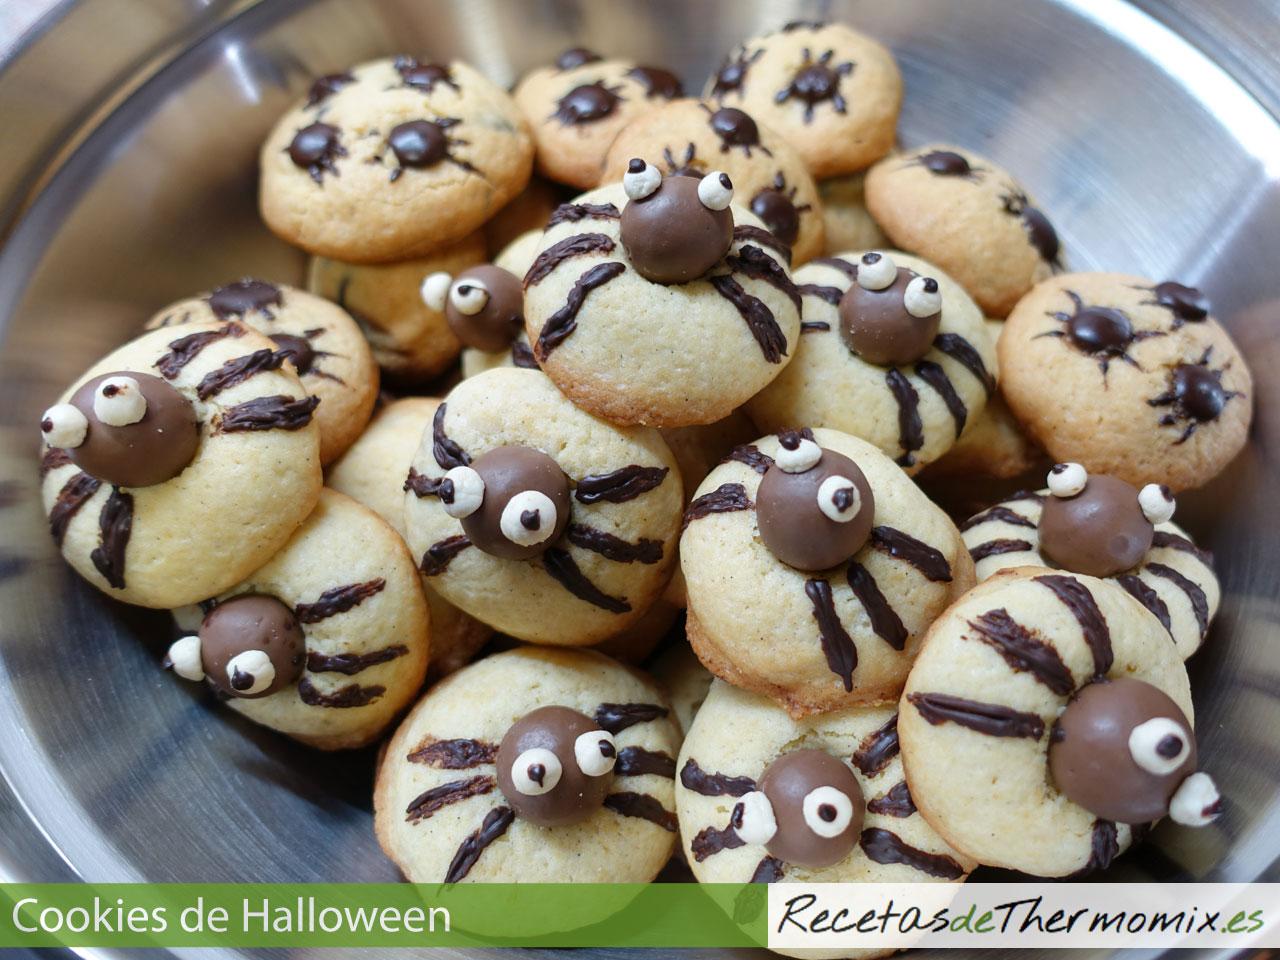 Cookies de Halloween con Thermomix